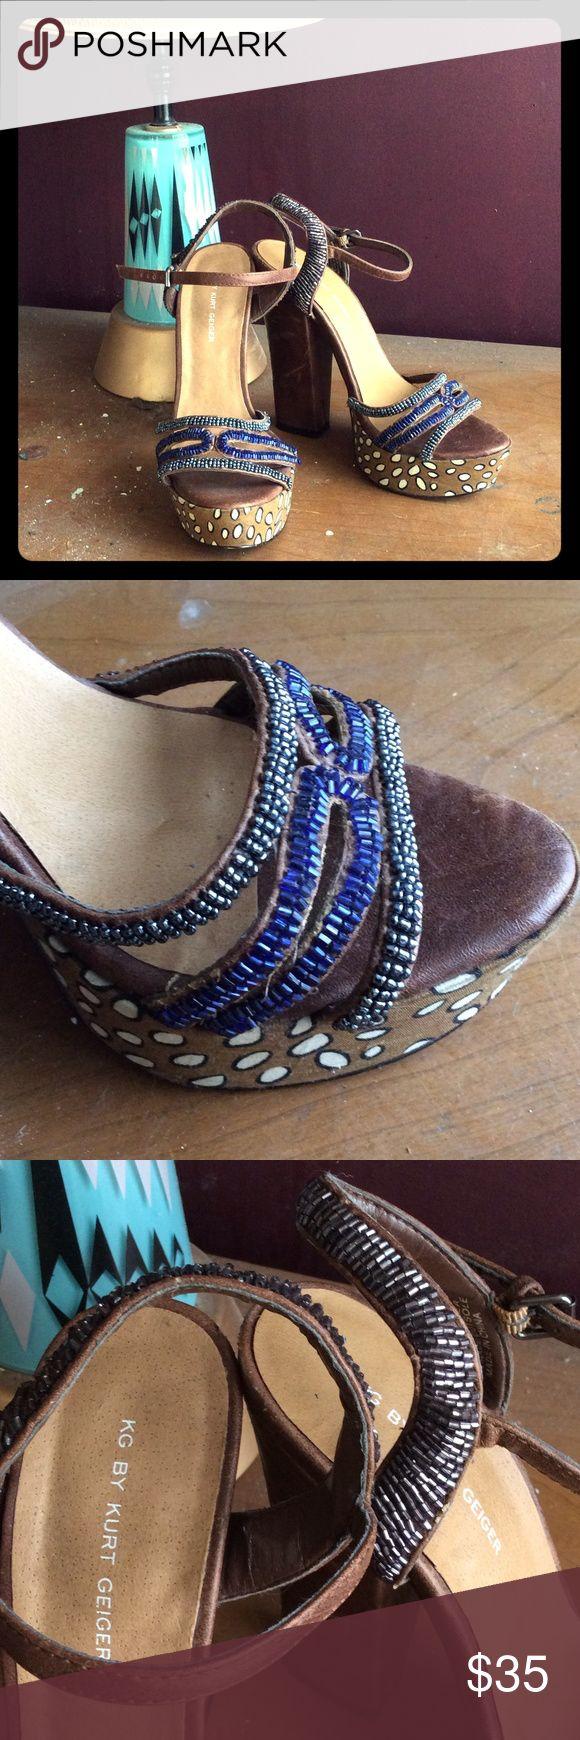 Kurt geiger Beaded bohemian platform heels Lovely beaded Kurt Geiger patform heel sandals! Perfect for pairing with your summer flowy bohemian chic outfit! kurt geiger Shoes Platforms